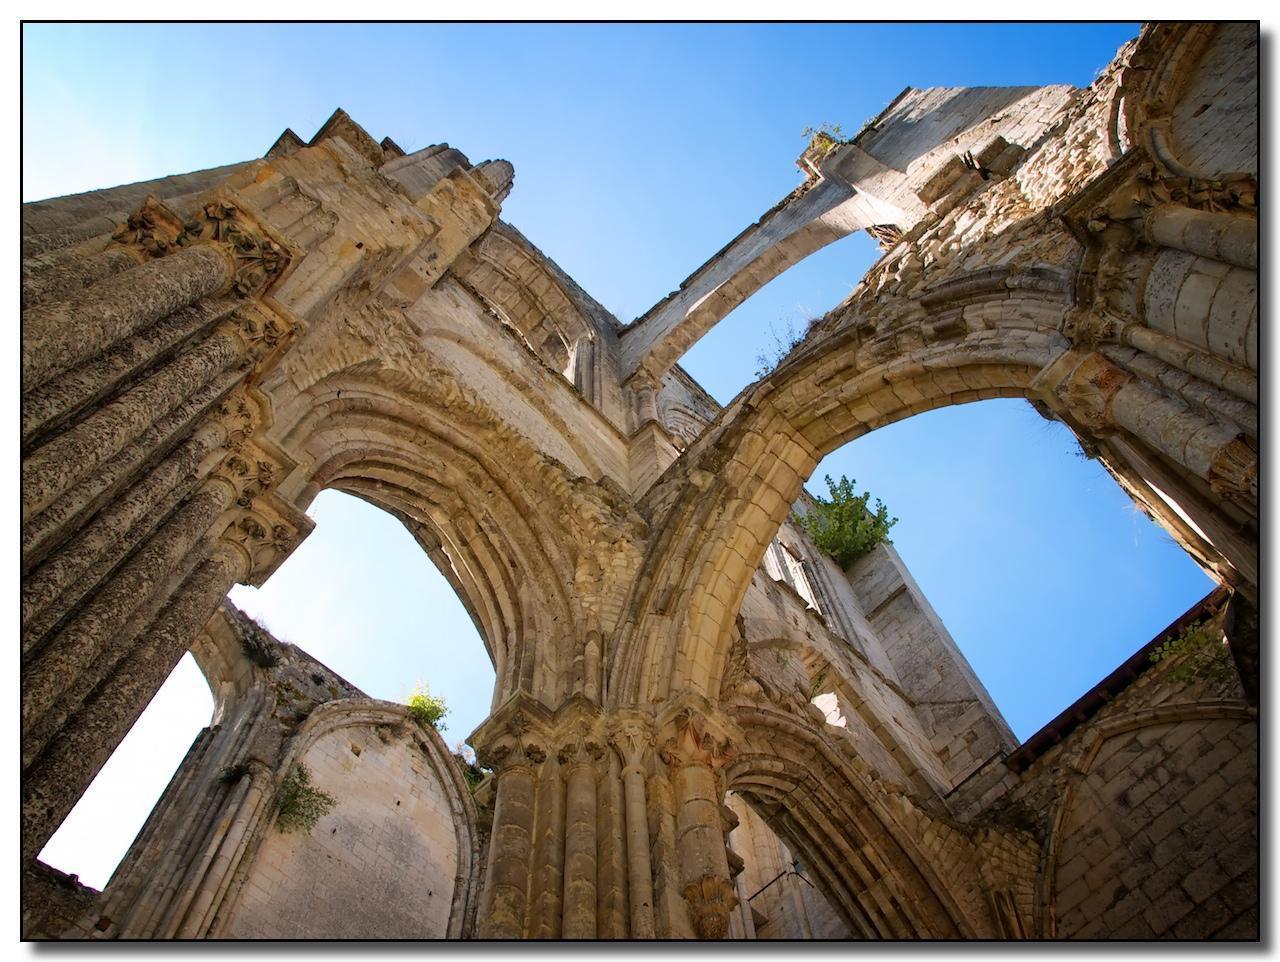 Abbaye de Fontenelle_Saint-Wandrille-Rançon